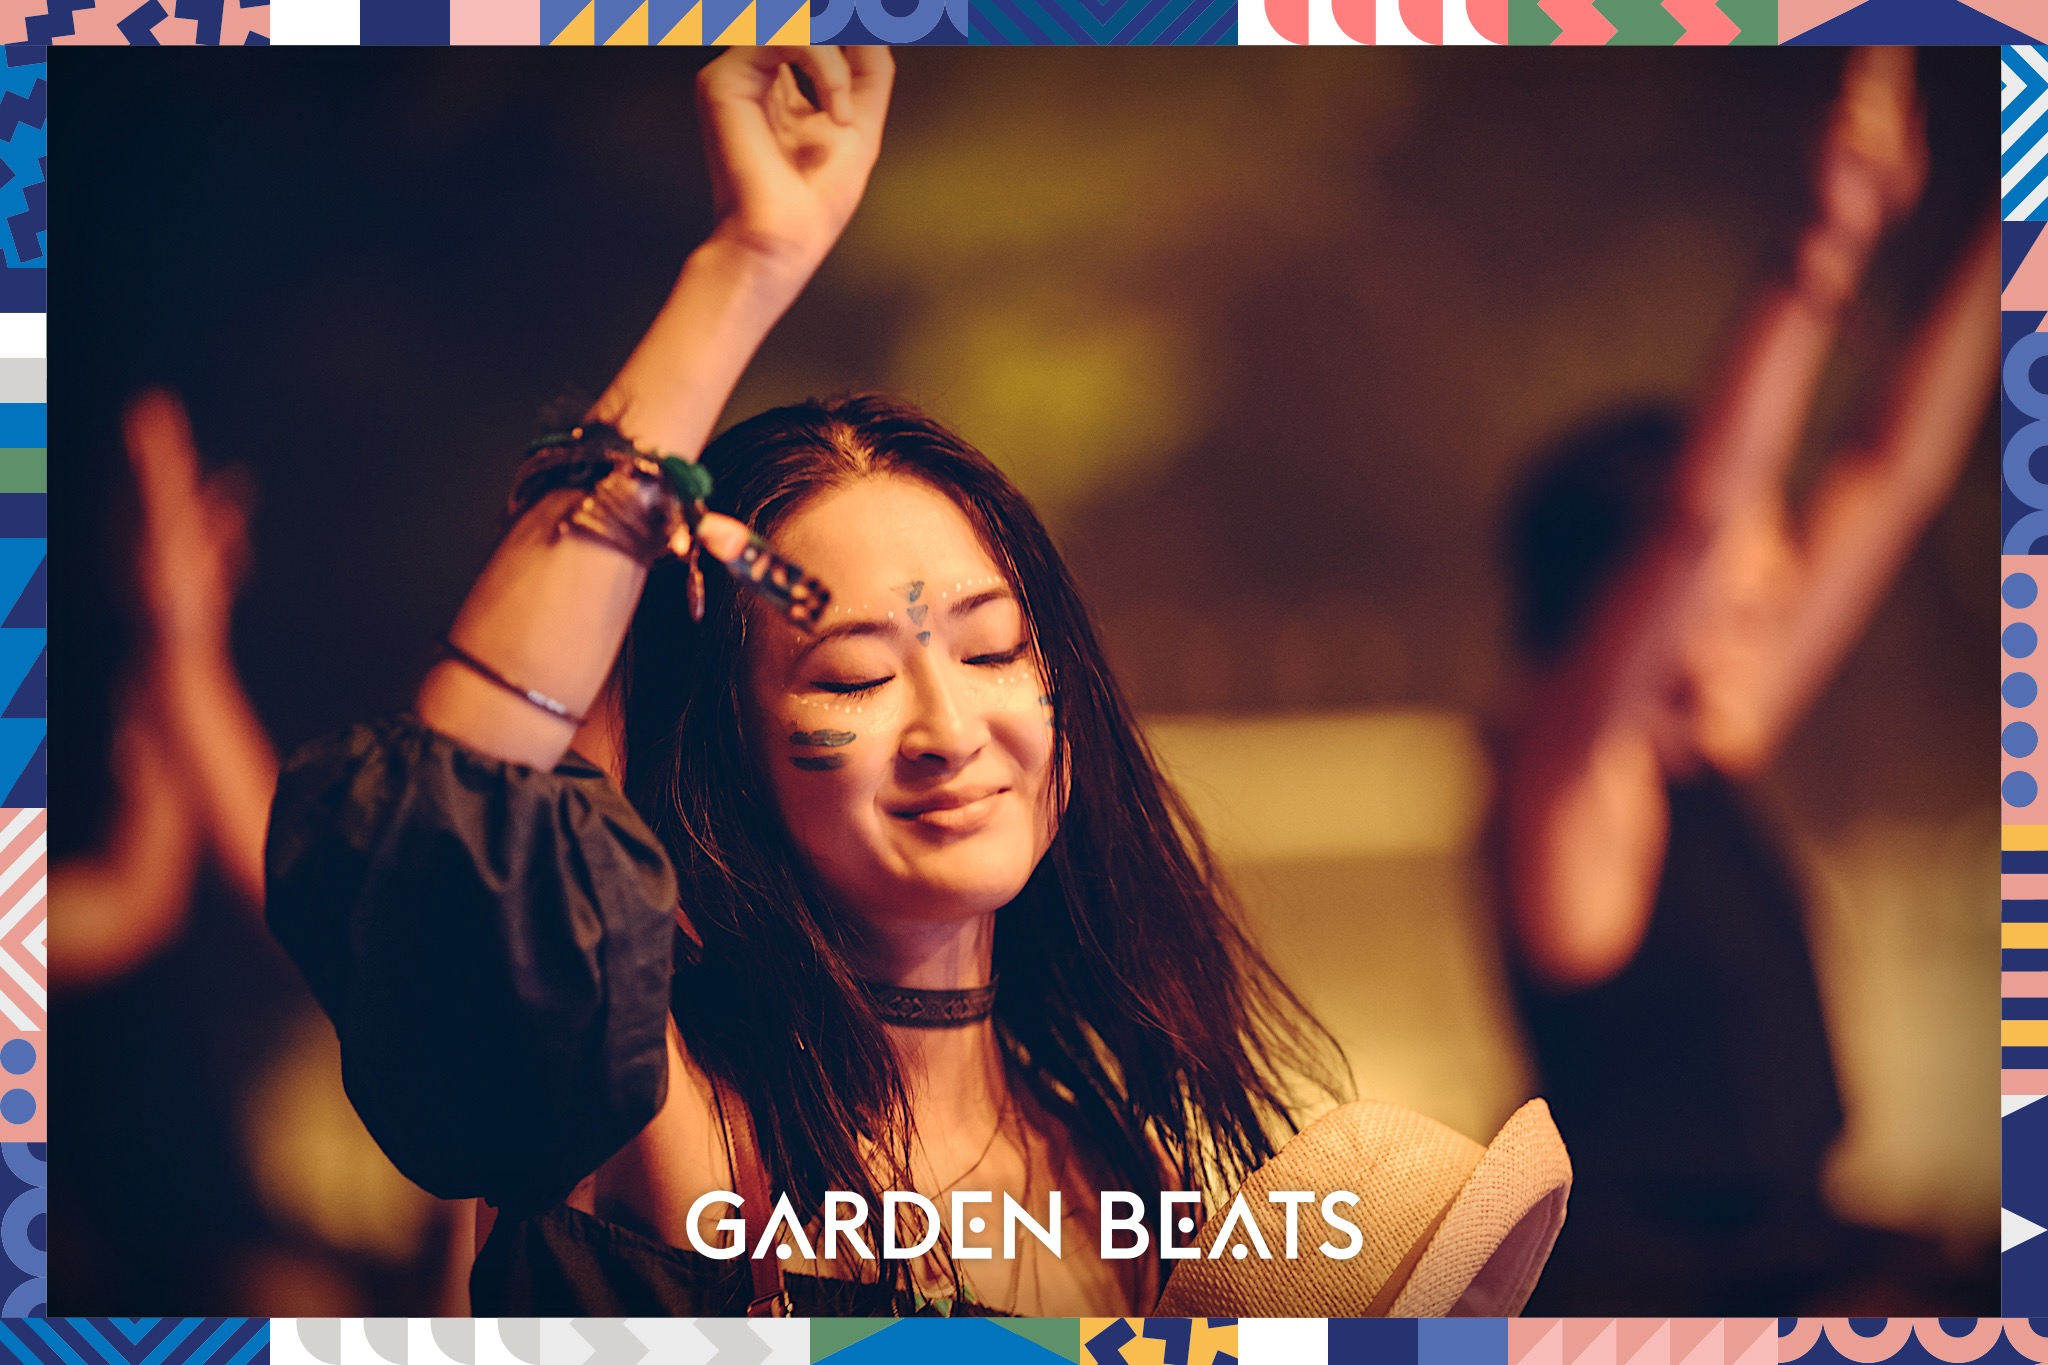 18032017_GardenBeats_Colossal802_WatermarkedGB.jpg